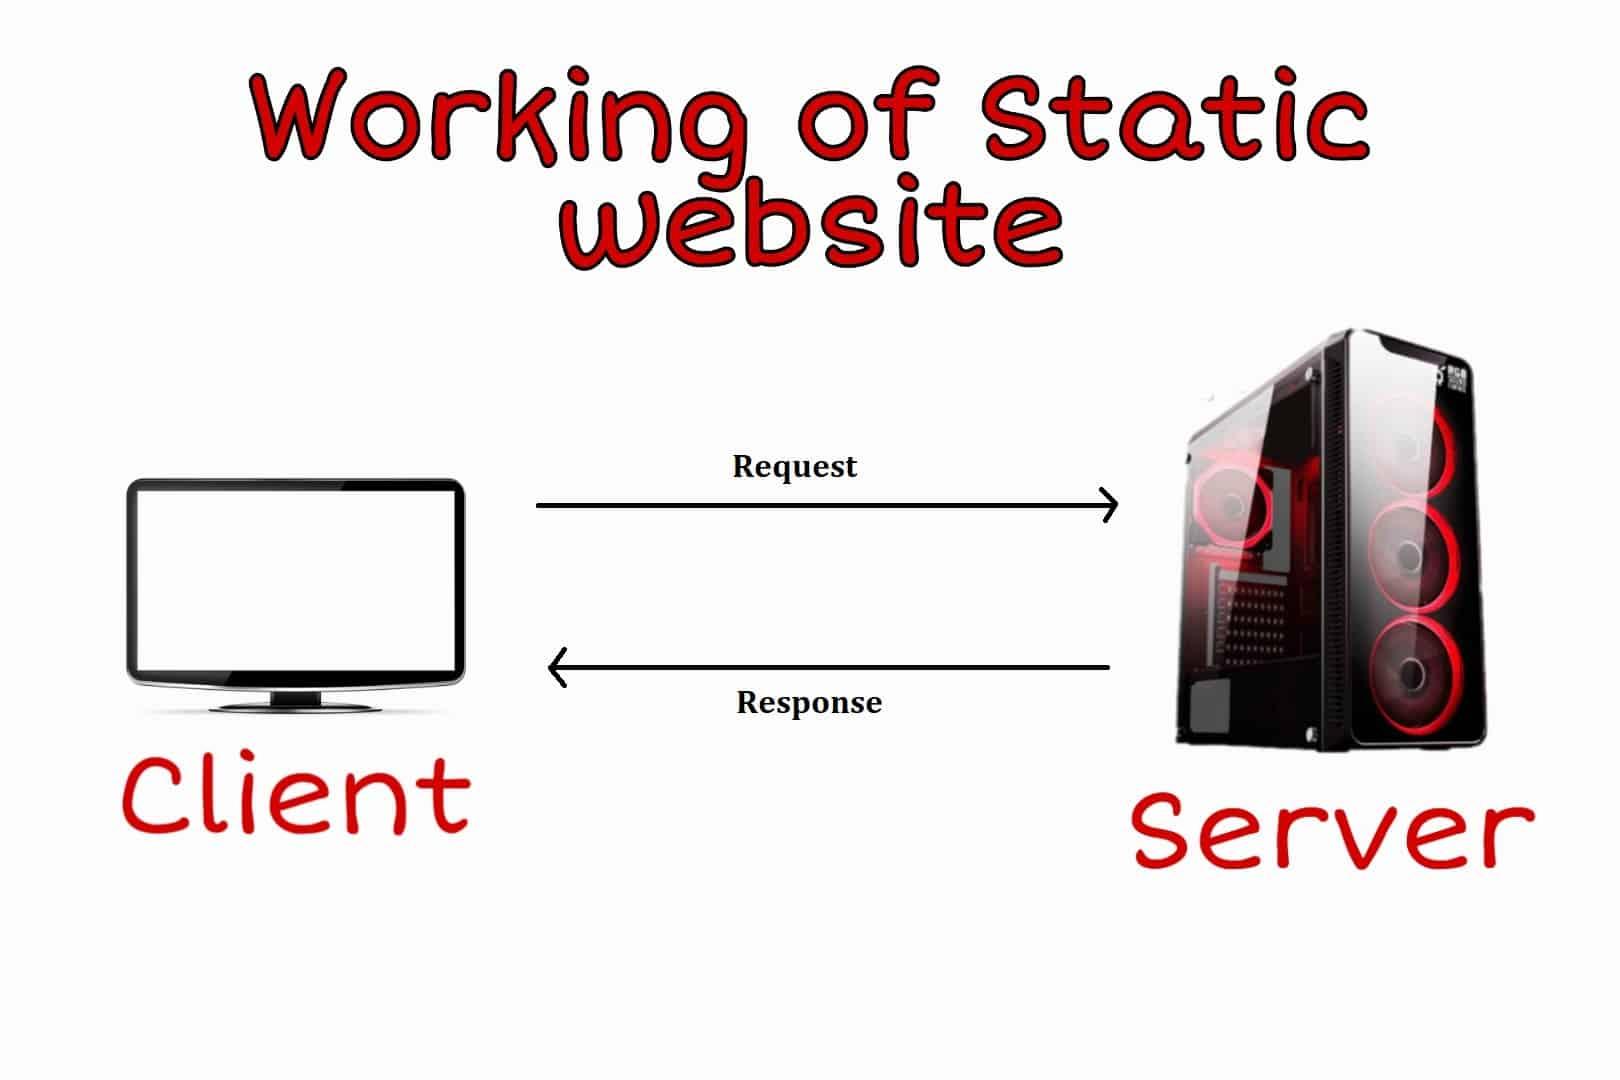 Static vs dynamic website - working of static websites